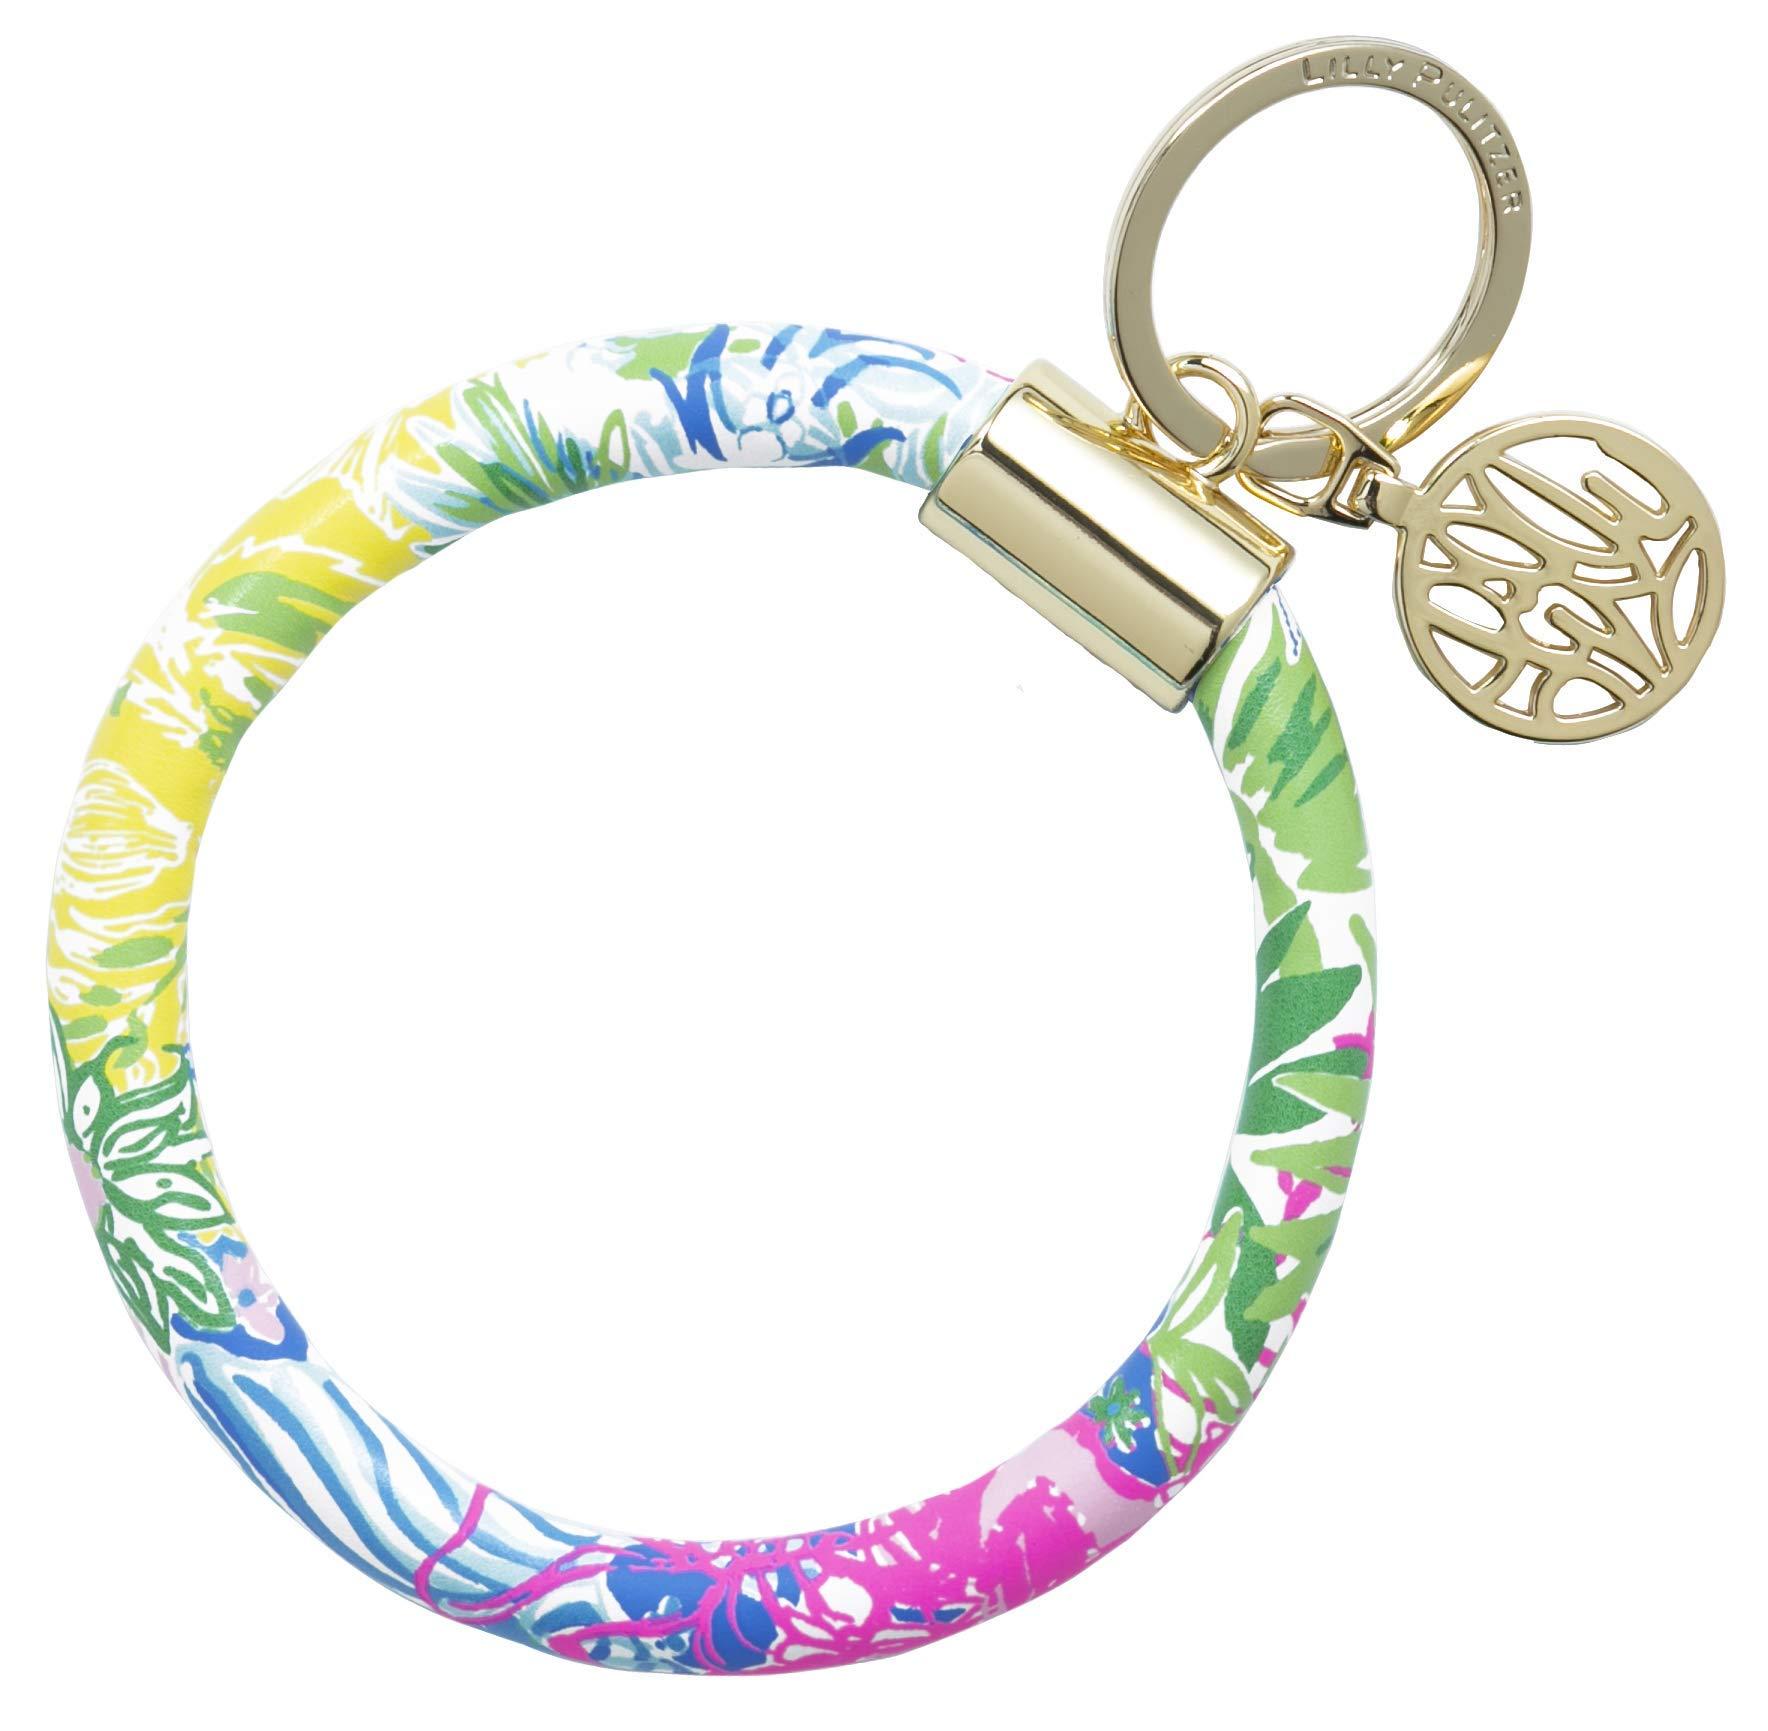 Lilly Pulitzer Bracelet Key Ring Chain, Cheek to Cheek